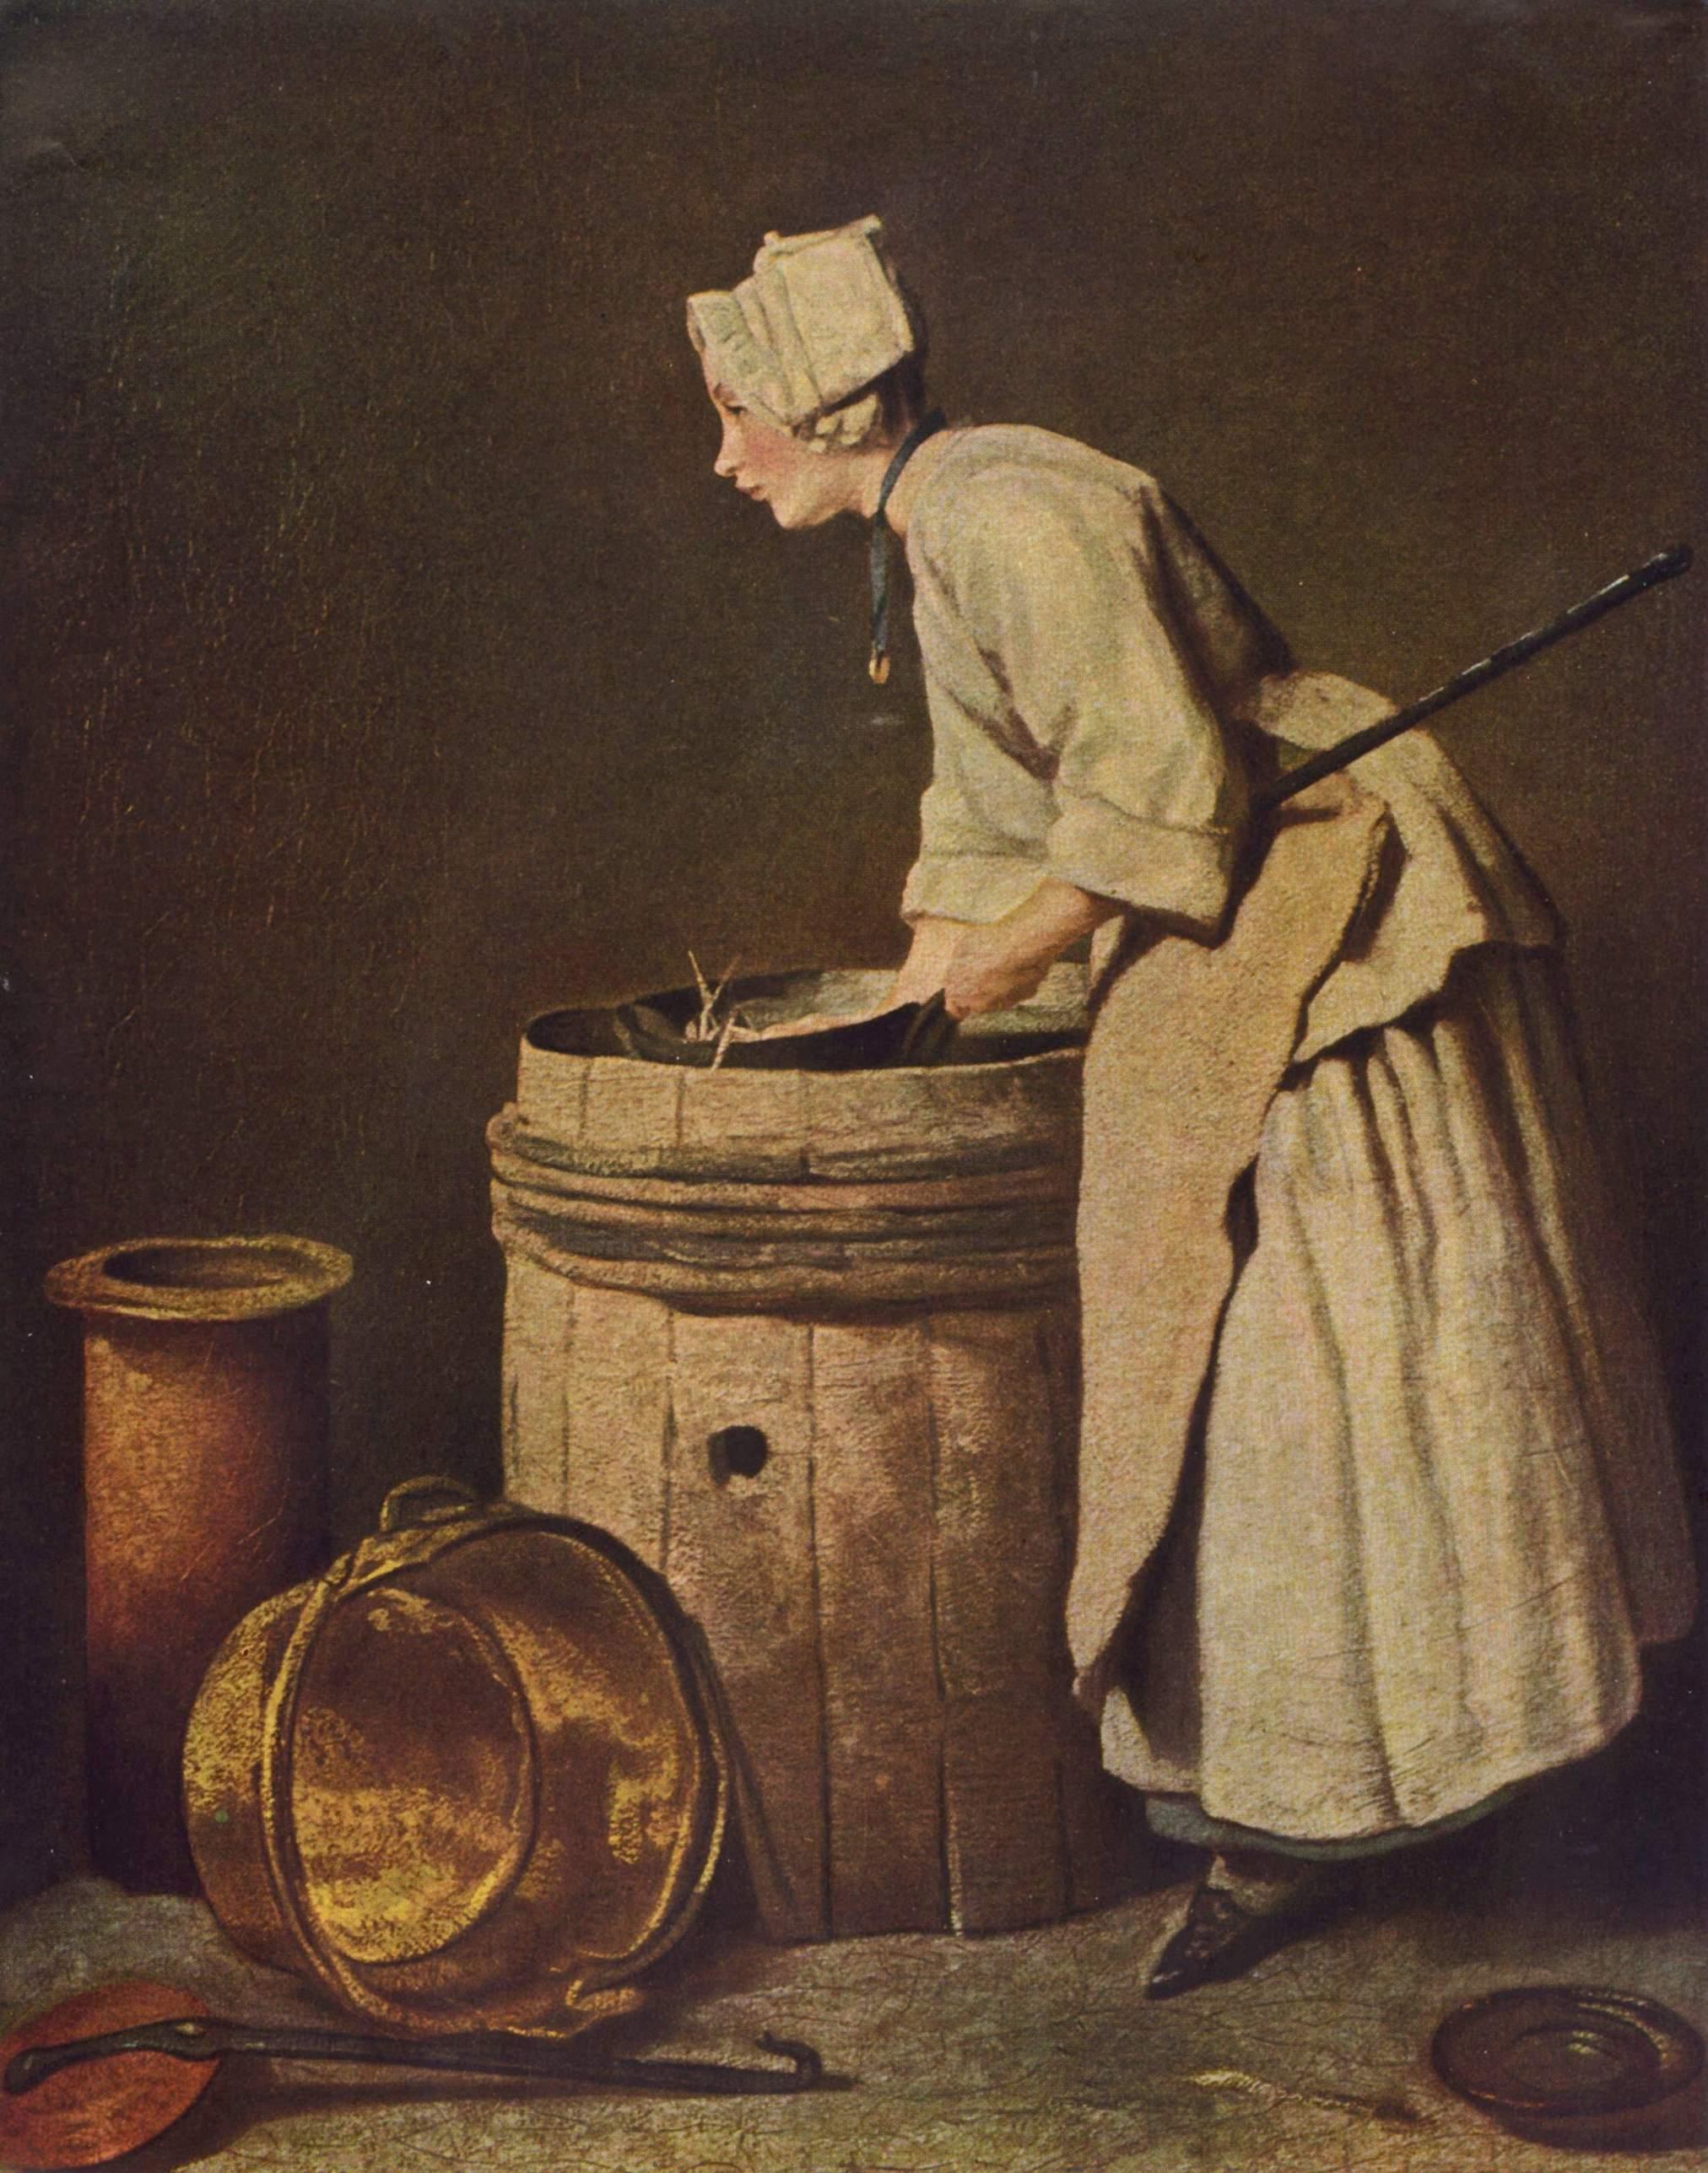 Jean-Baptiste Siméon Chardin, The Scullery Maid http://commons.wikimedia.org/wiki/File:Jean-Baptiste_Sim%C3%A9on_Chardin_020.jpg